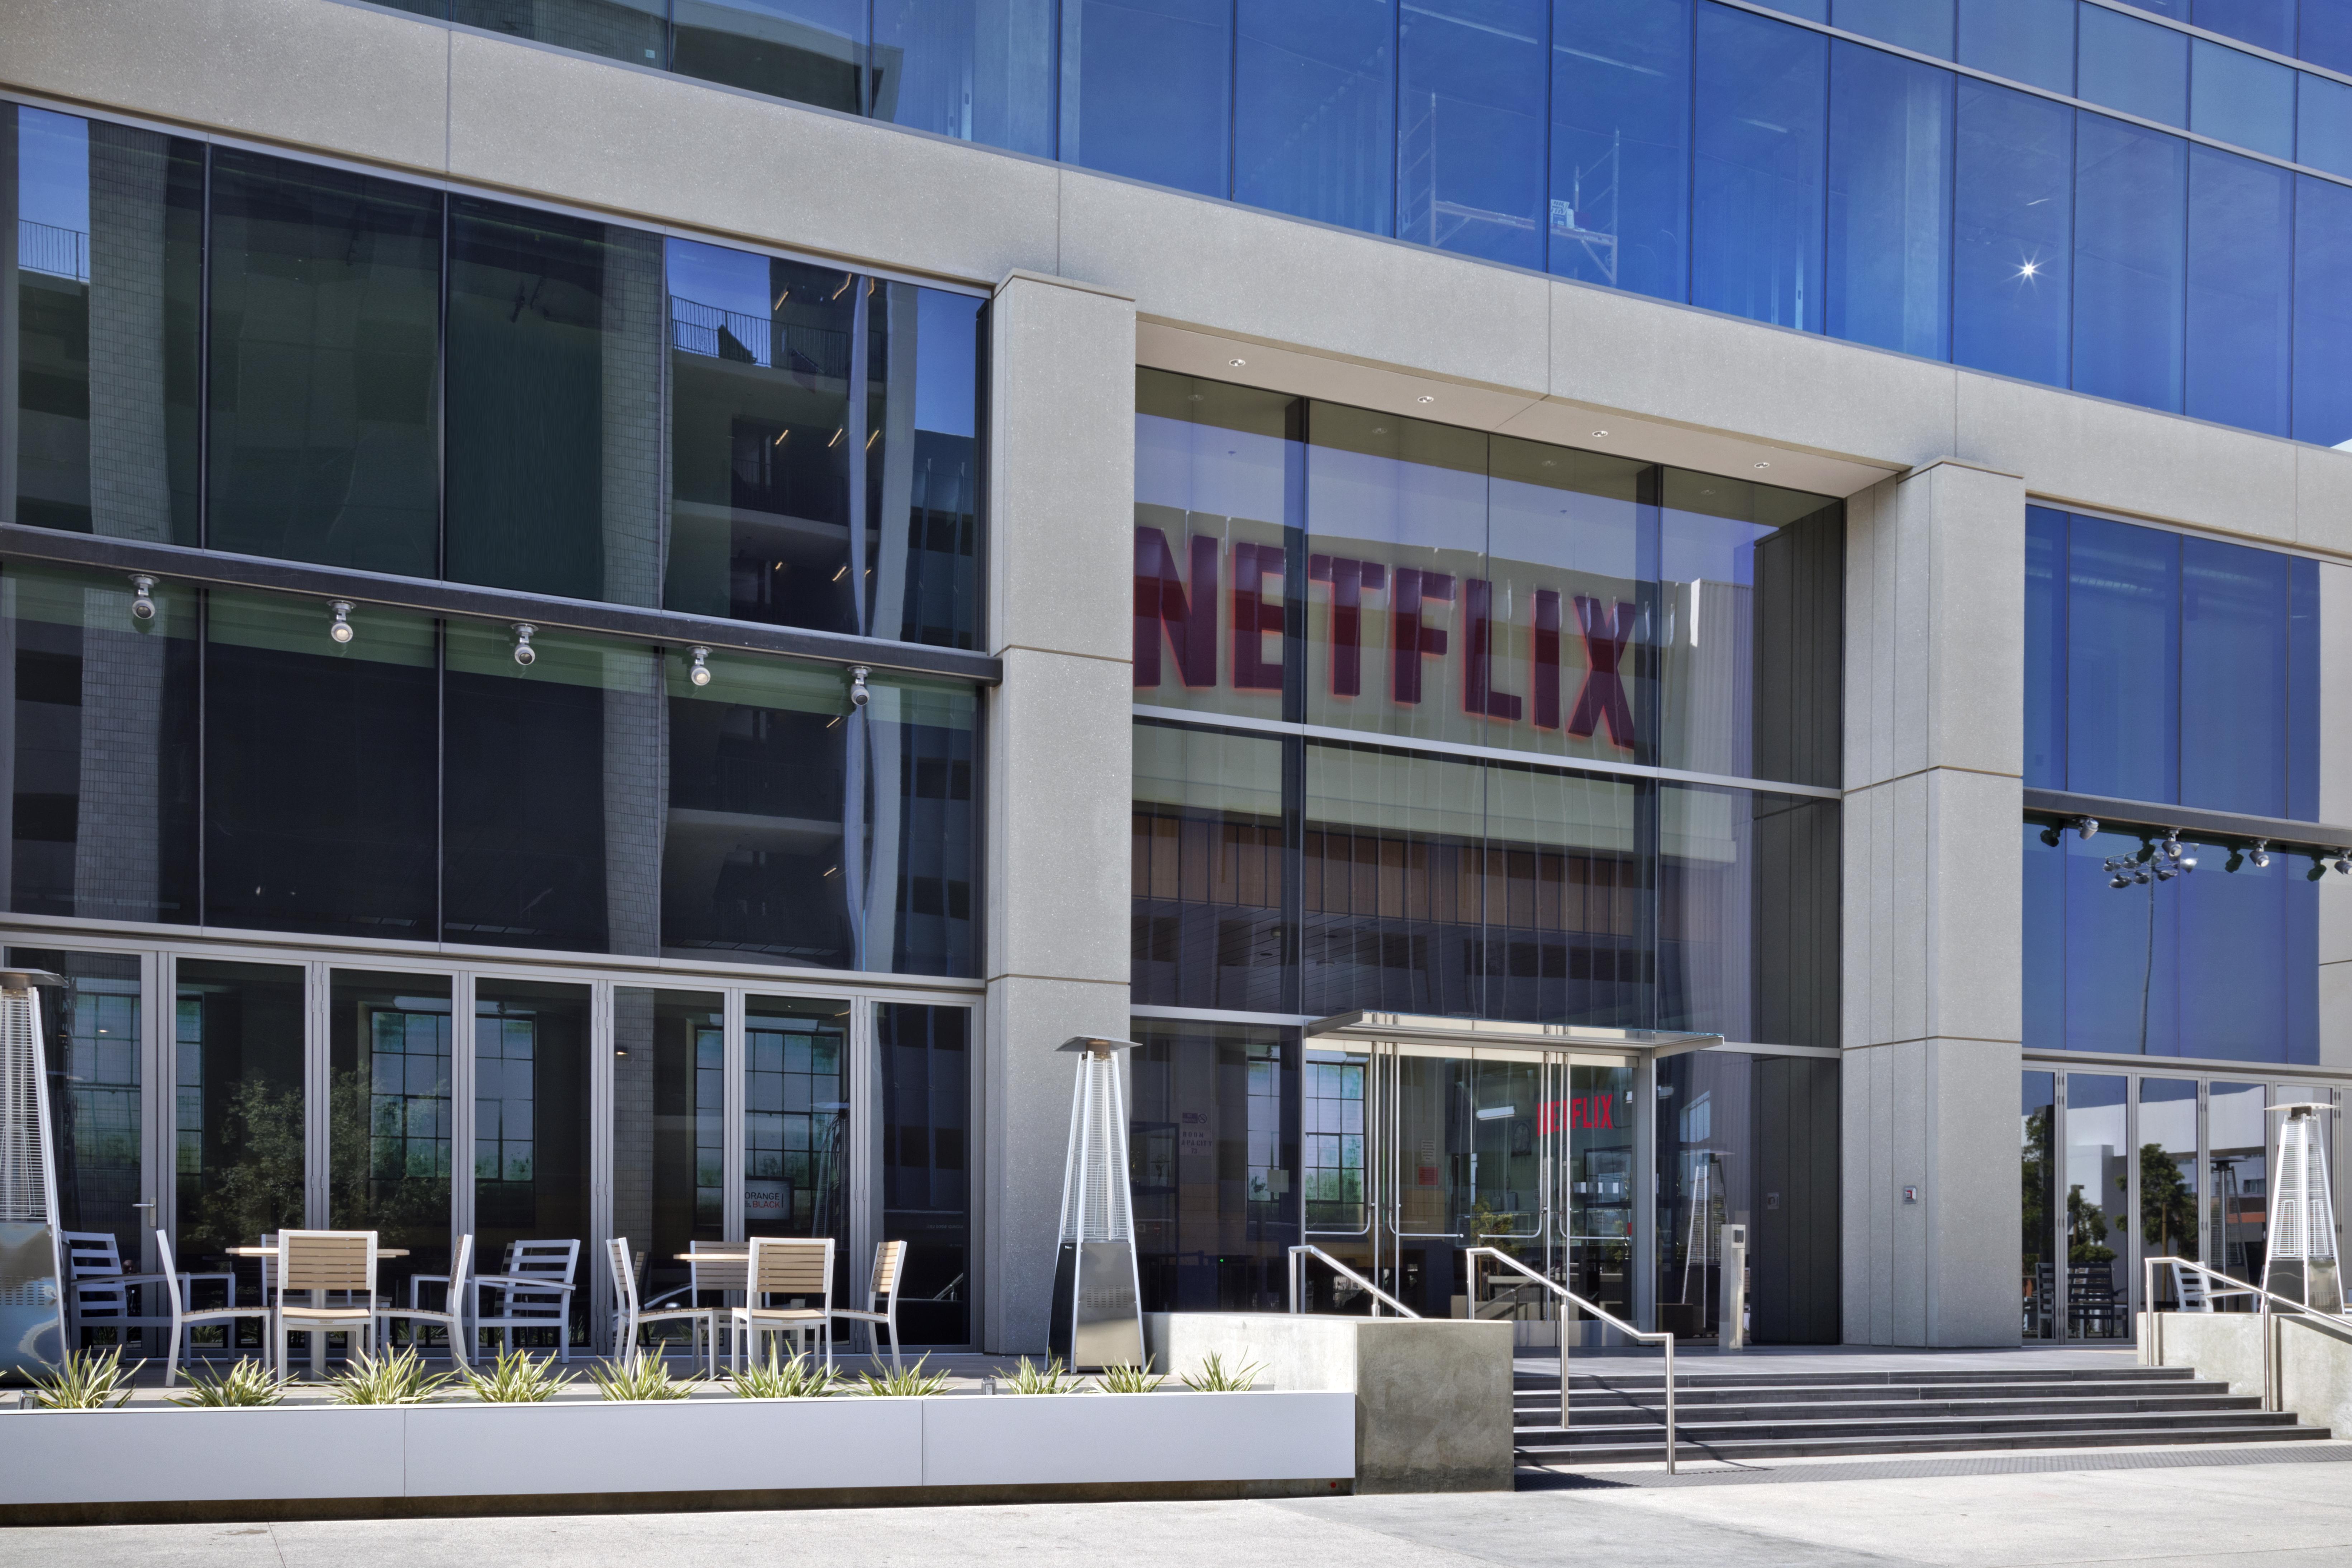 Netflix's office in Los Angeles